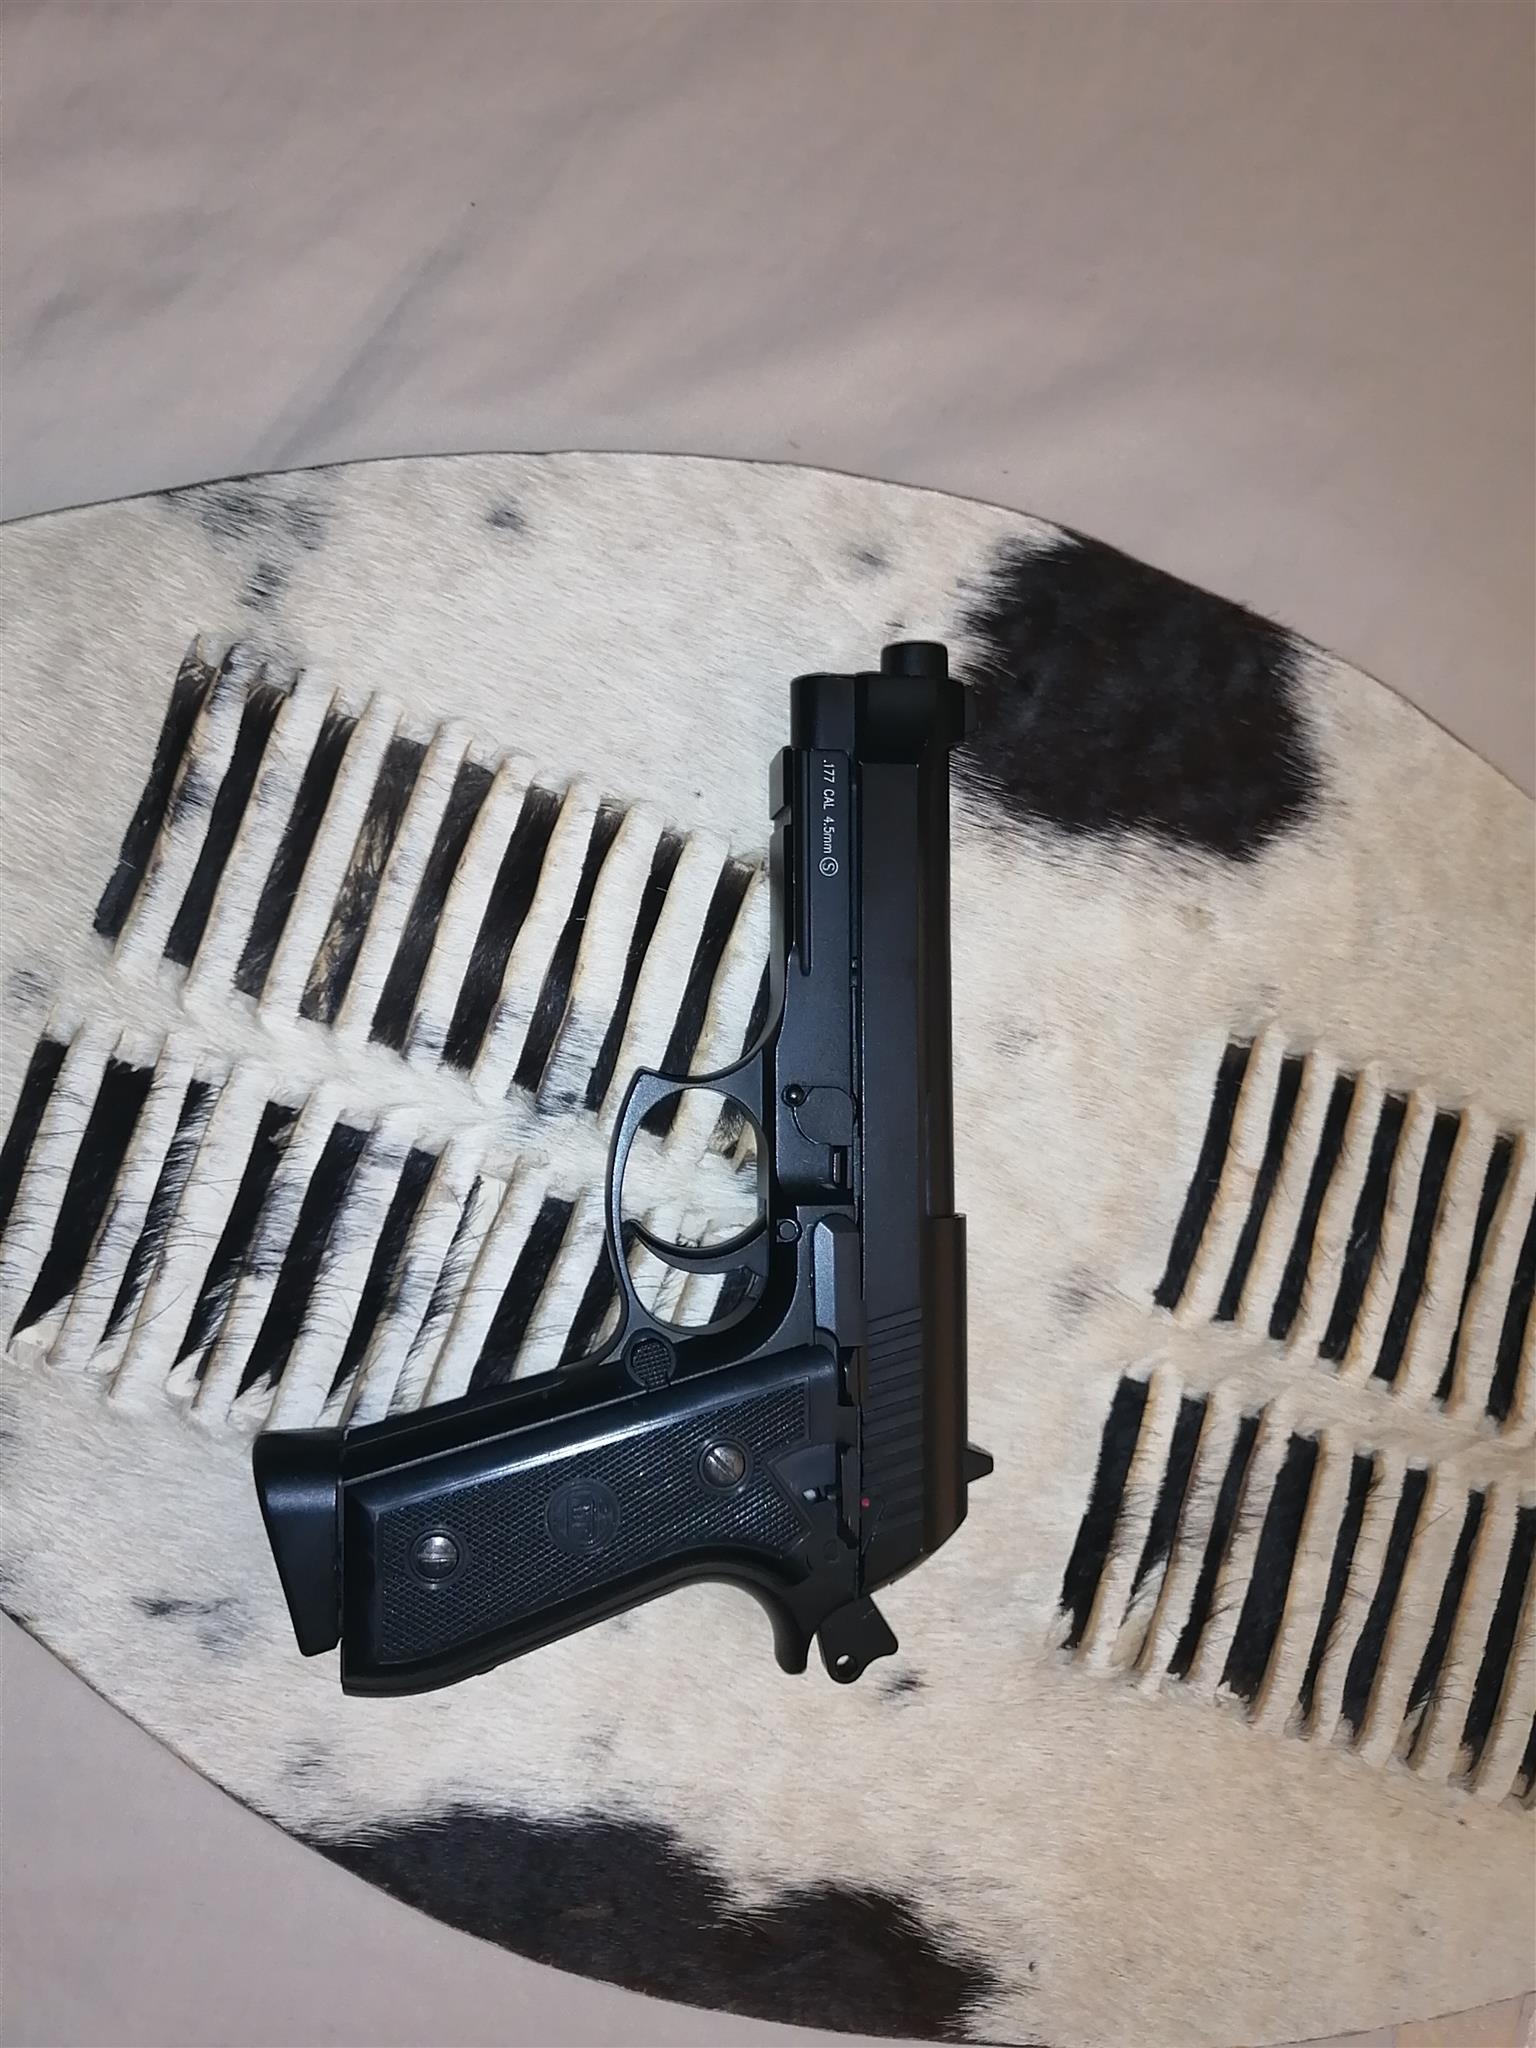 Beretta airsoft gun